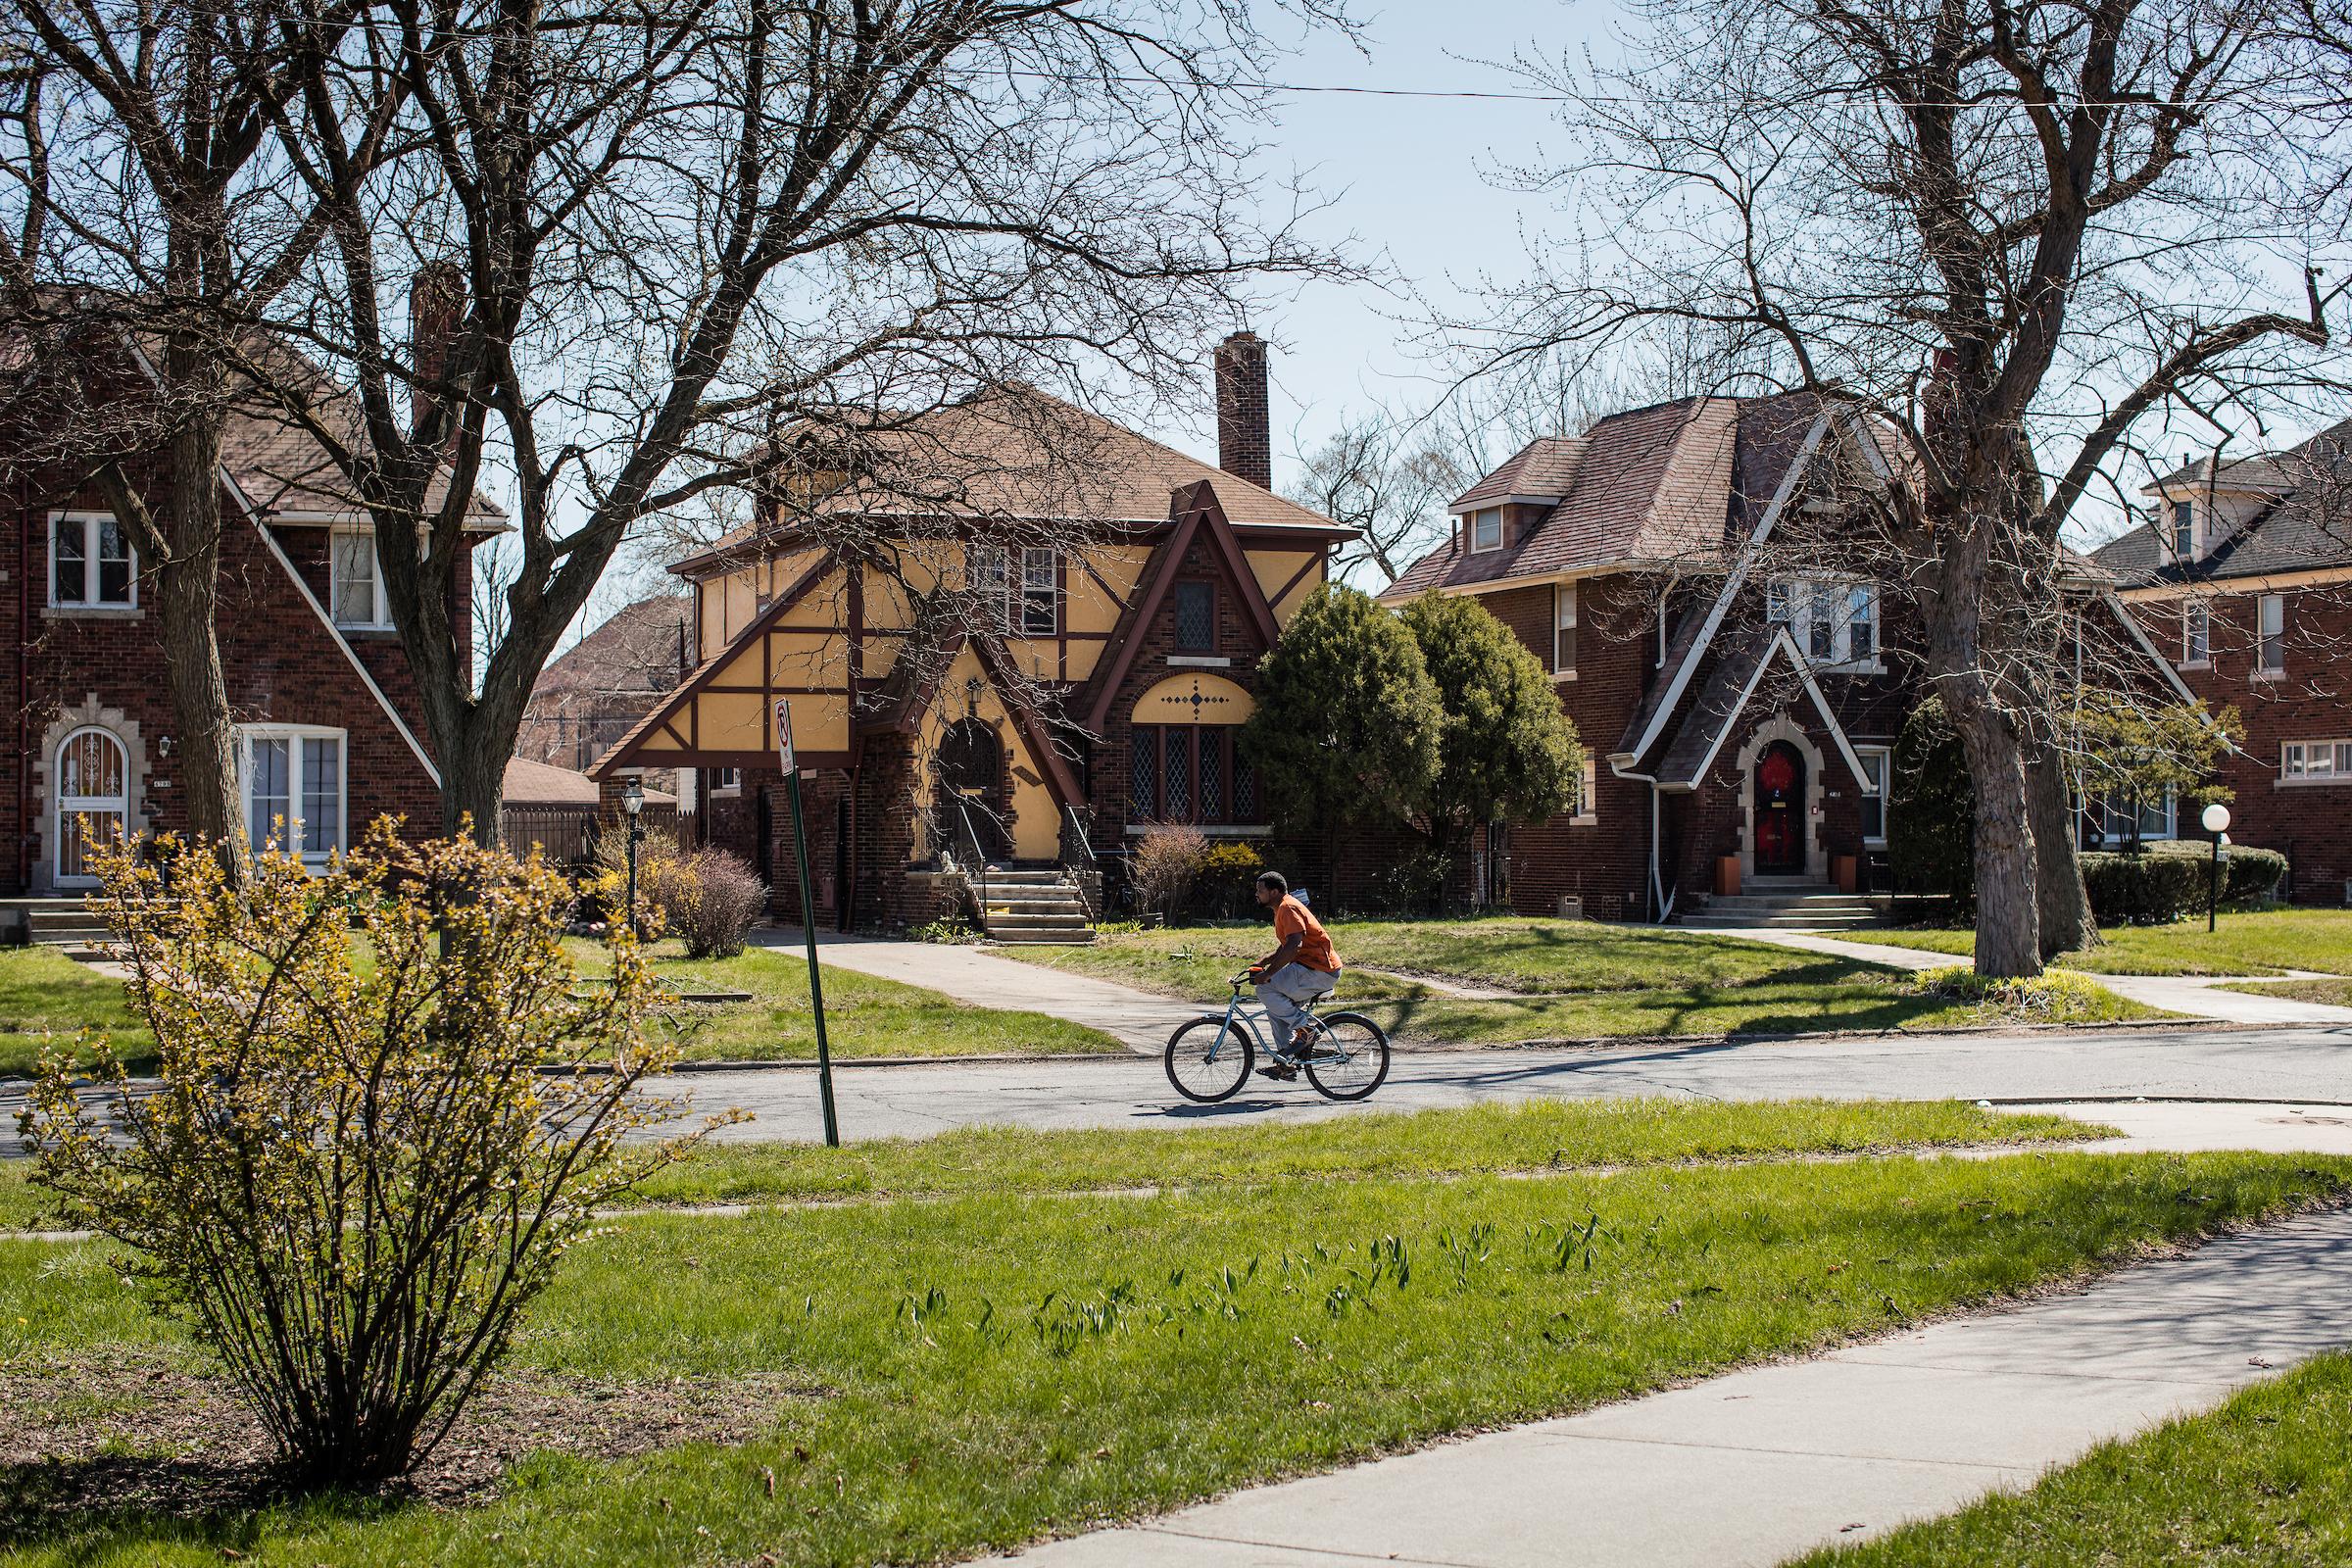 A neighborhood street, with three tudor style houses, a man on a bike is riding by.